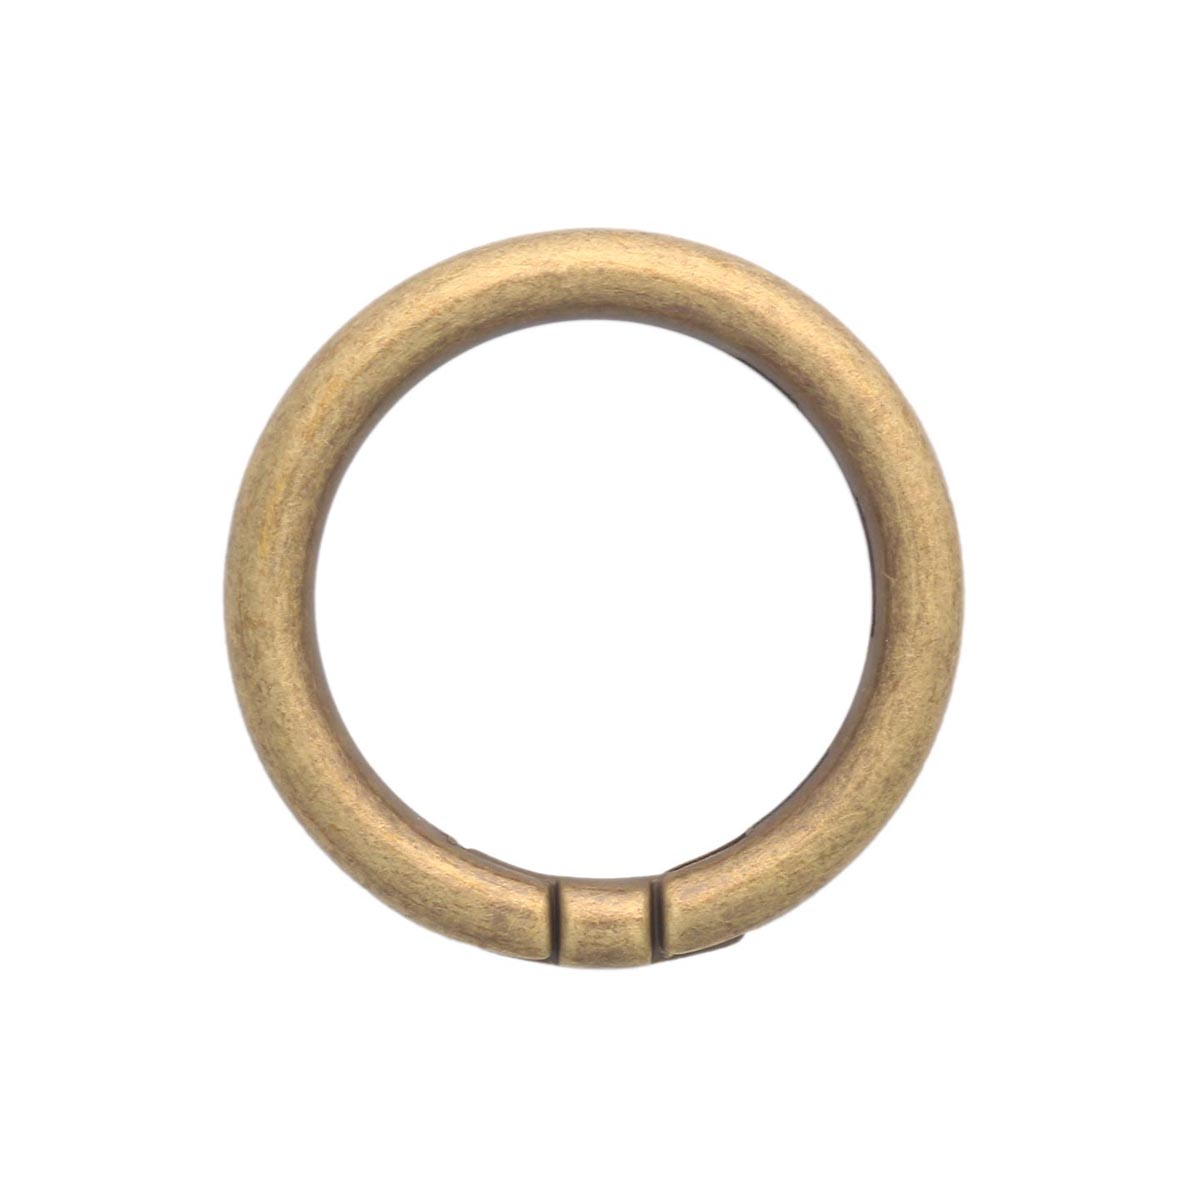 69252 Кольцо разъемное на винтах 30мм лат.